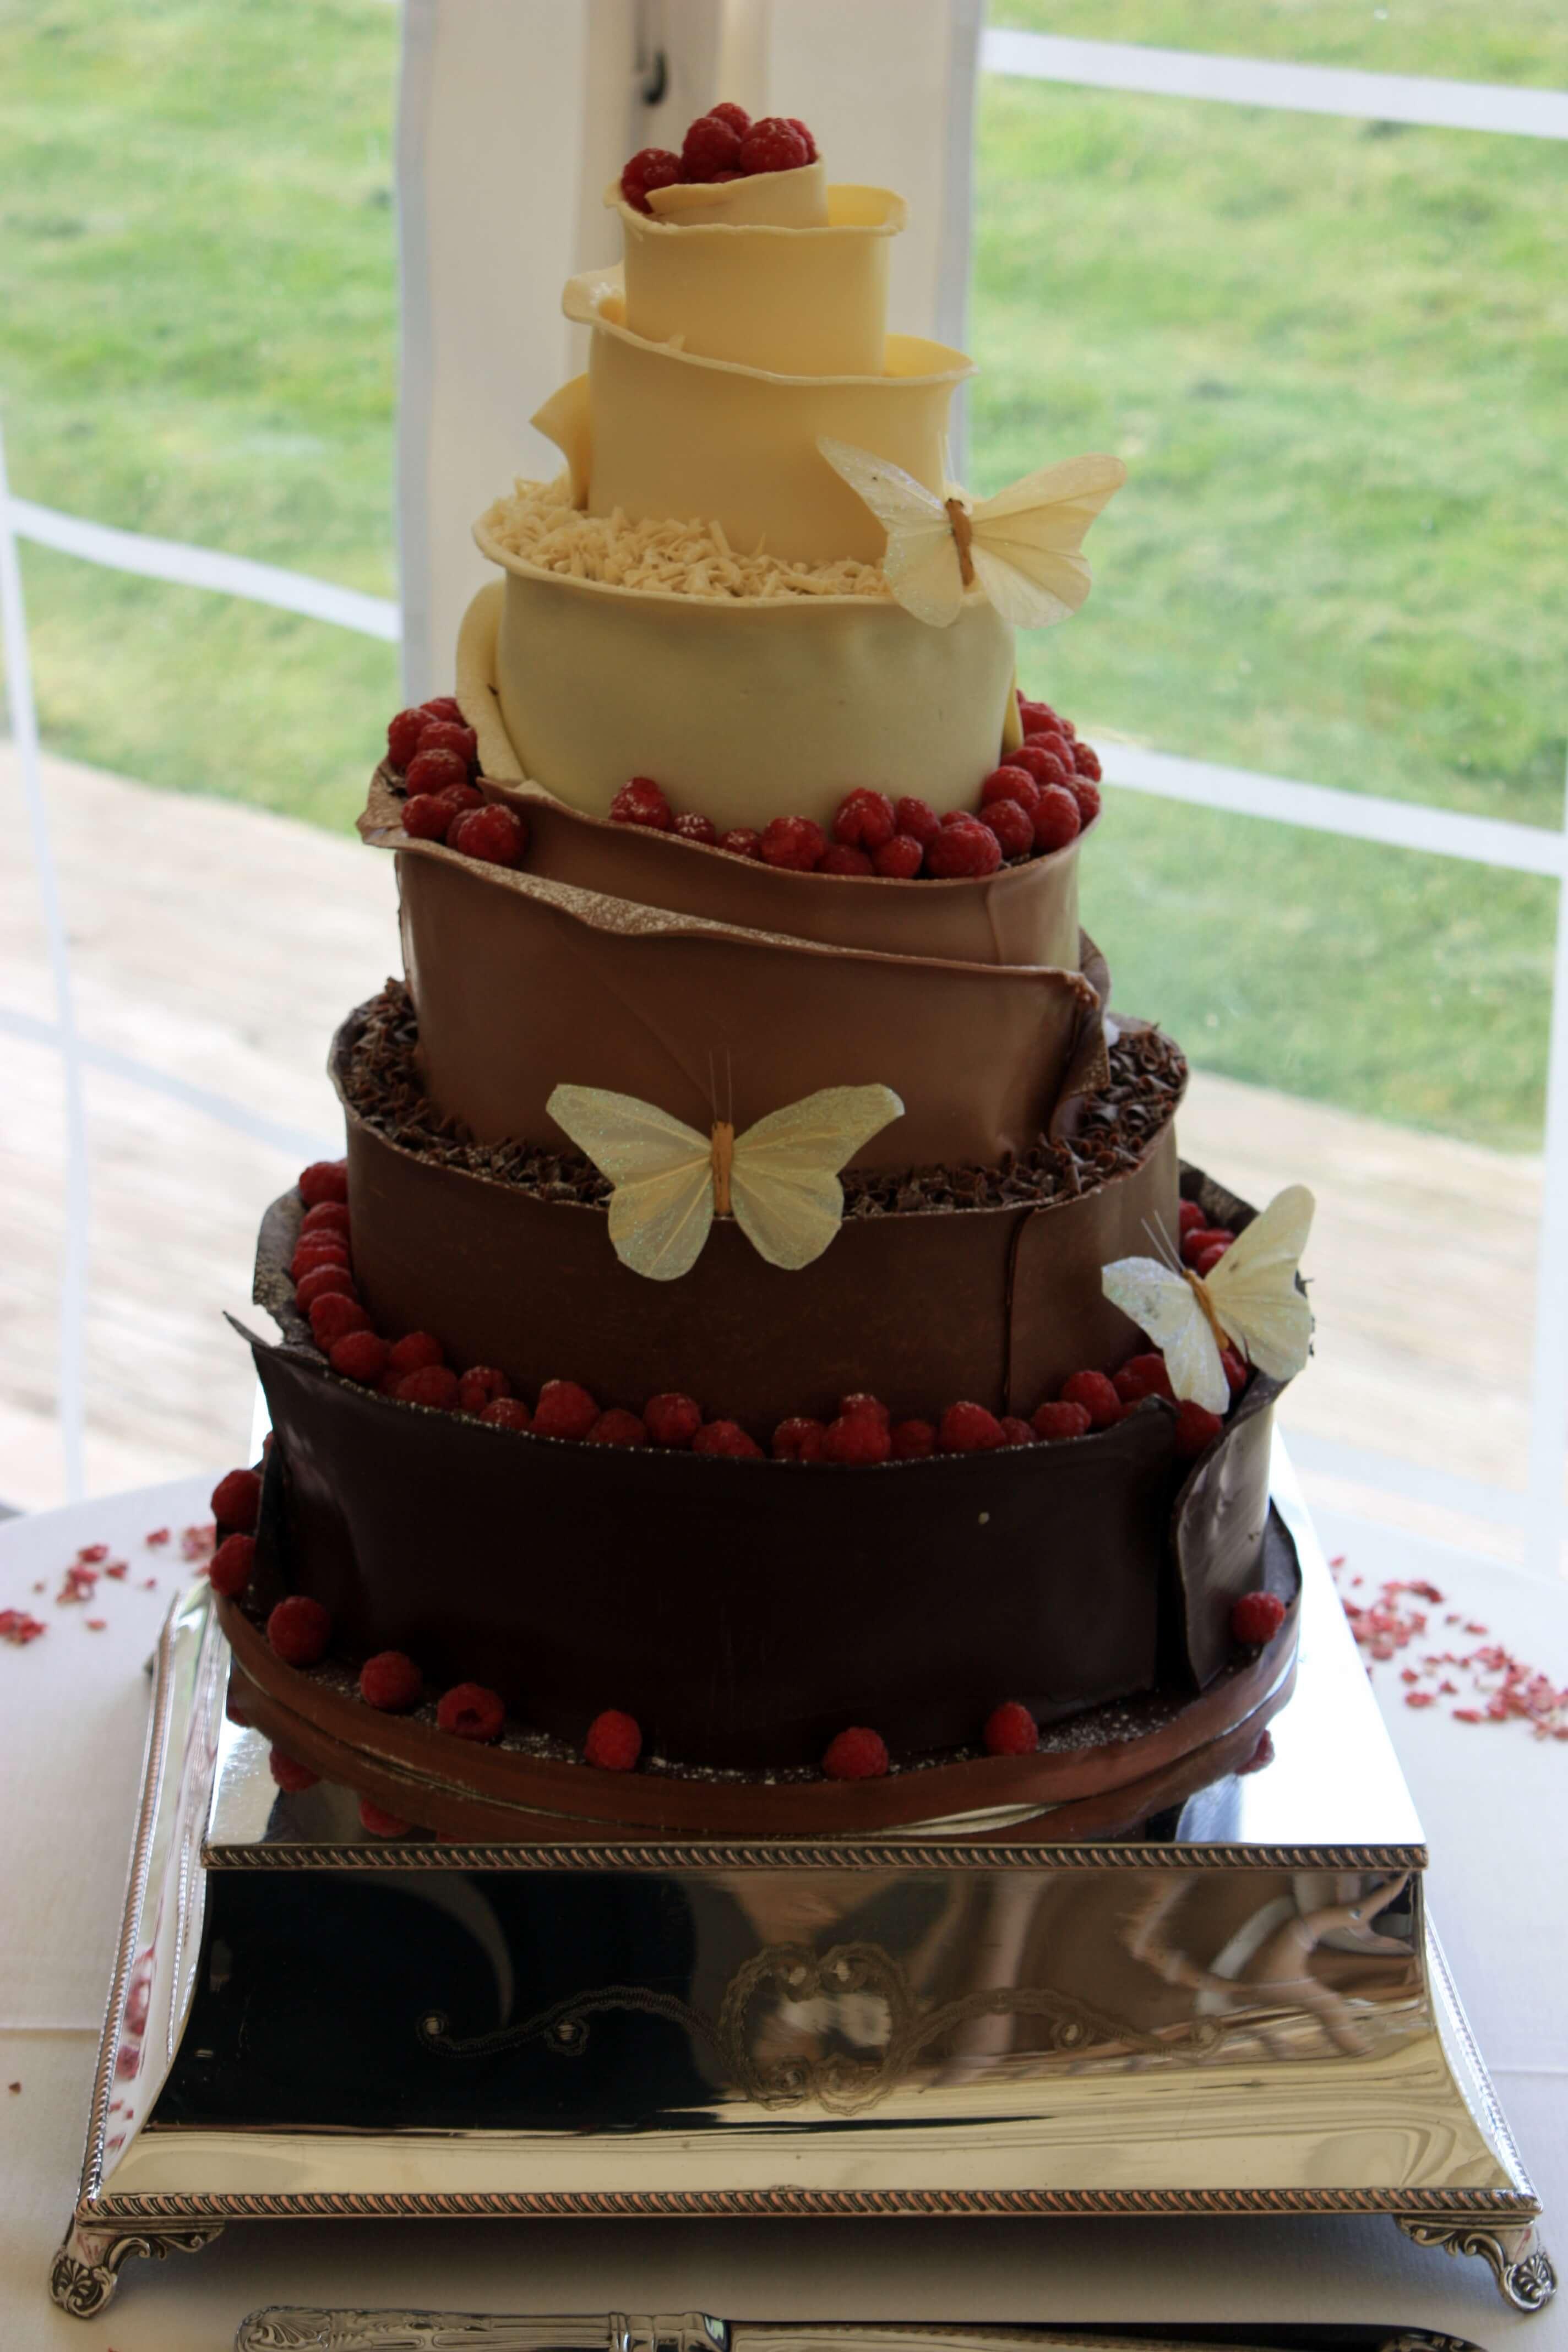 The Triple Chocolate Tower Cake Sweet As Cakes Award